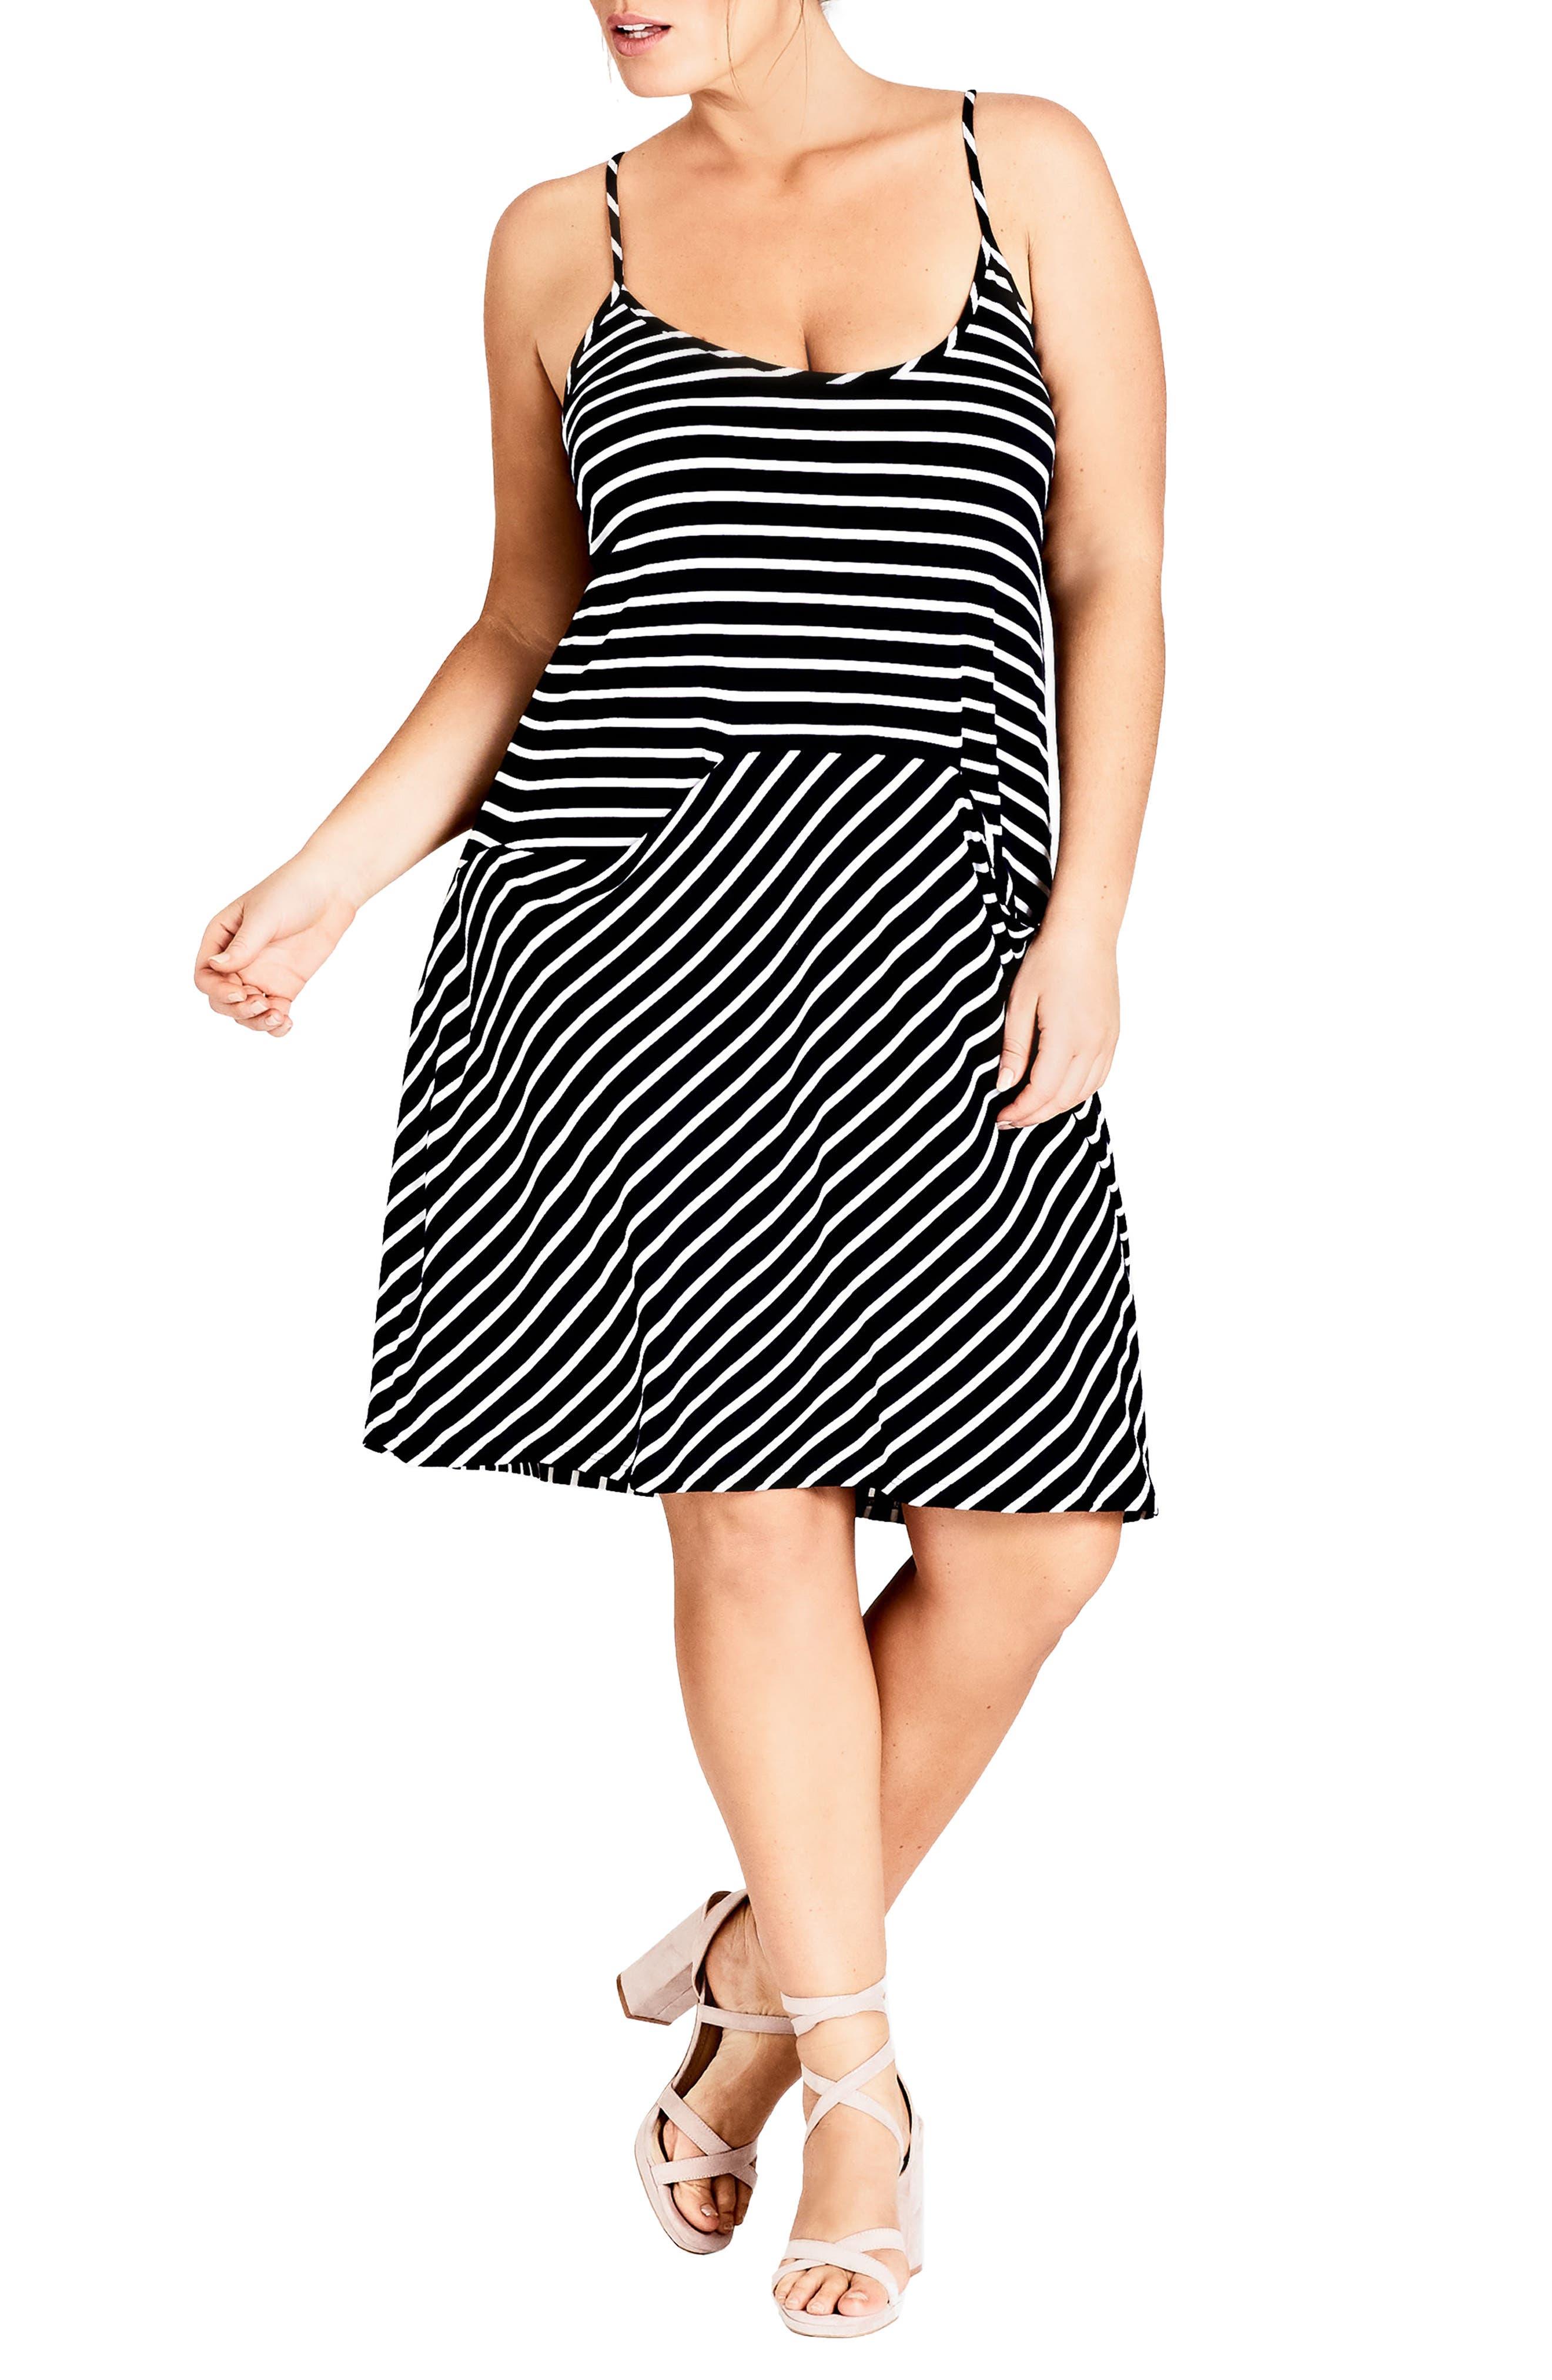 Beachy Days Dress,                         Main,                         color, BLACK STRIPE